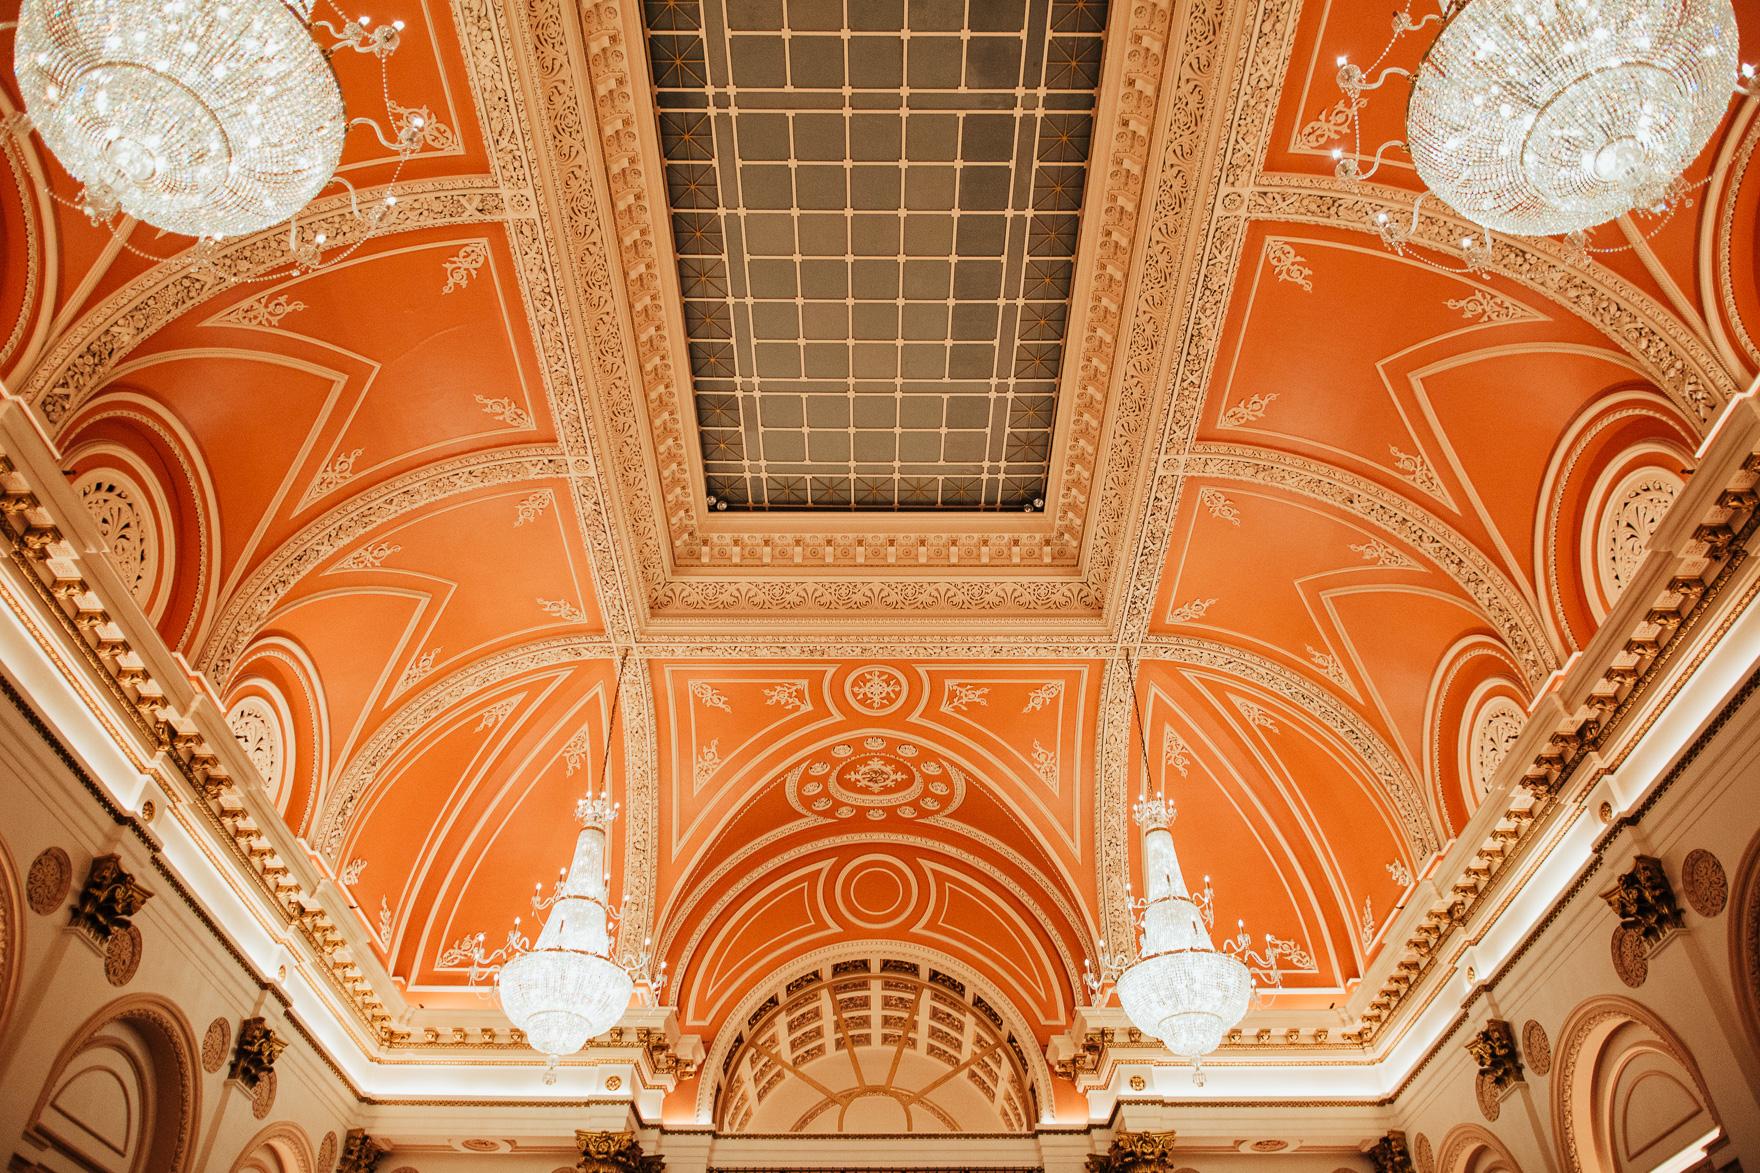 A close up of an orange building